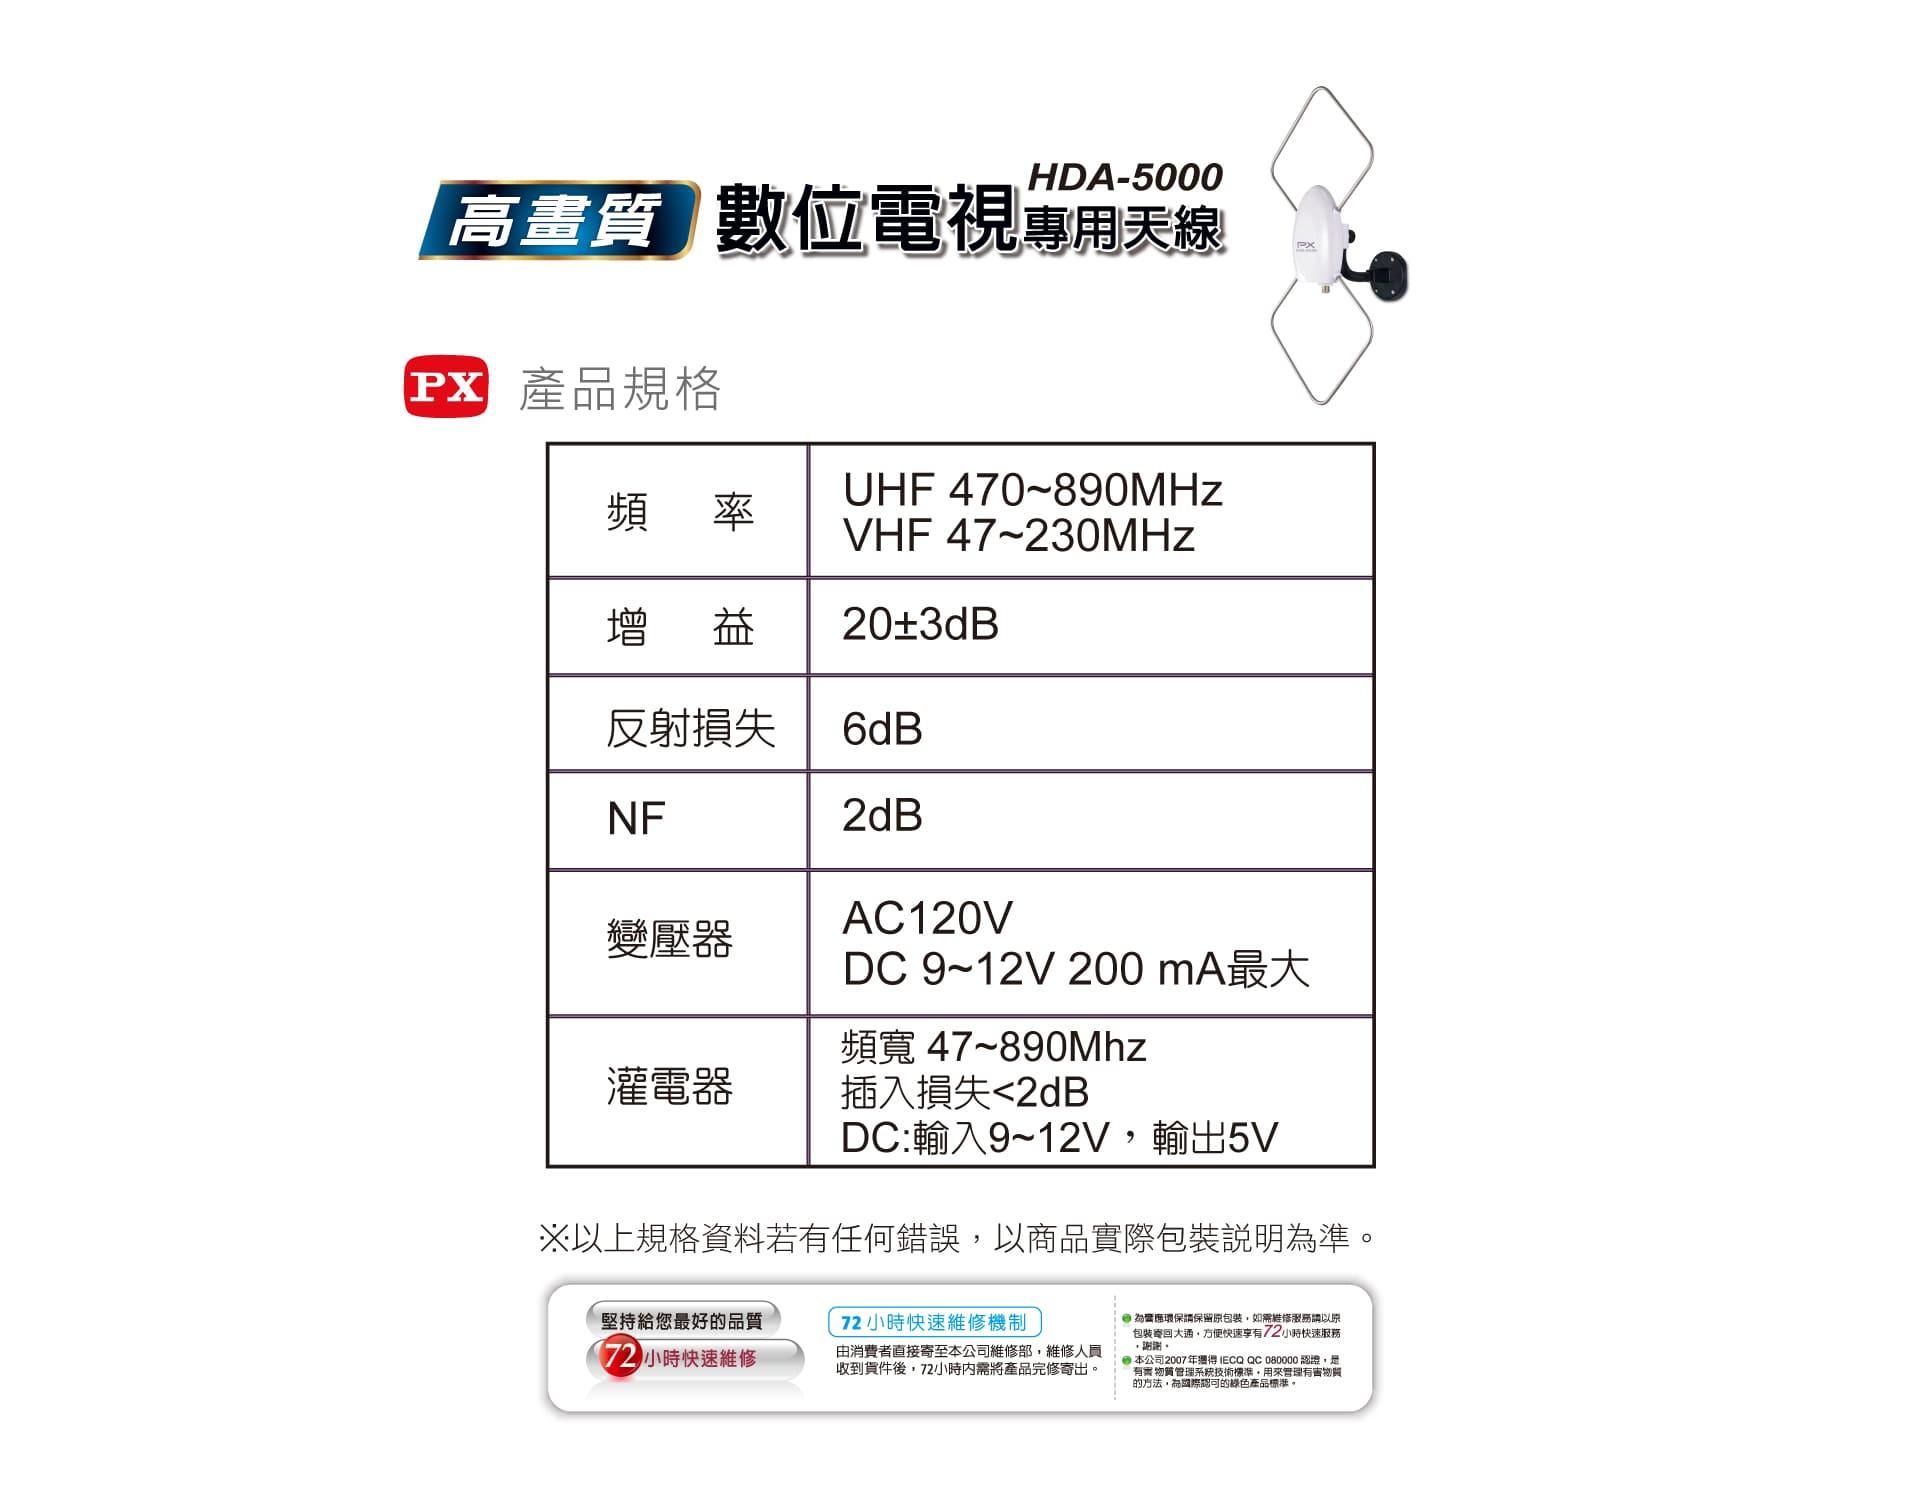 proimages/product/Antenna/HDA-5000/HDA-5000-06.jpg